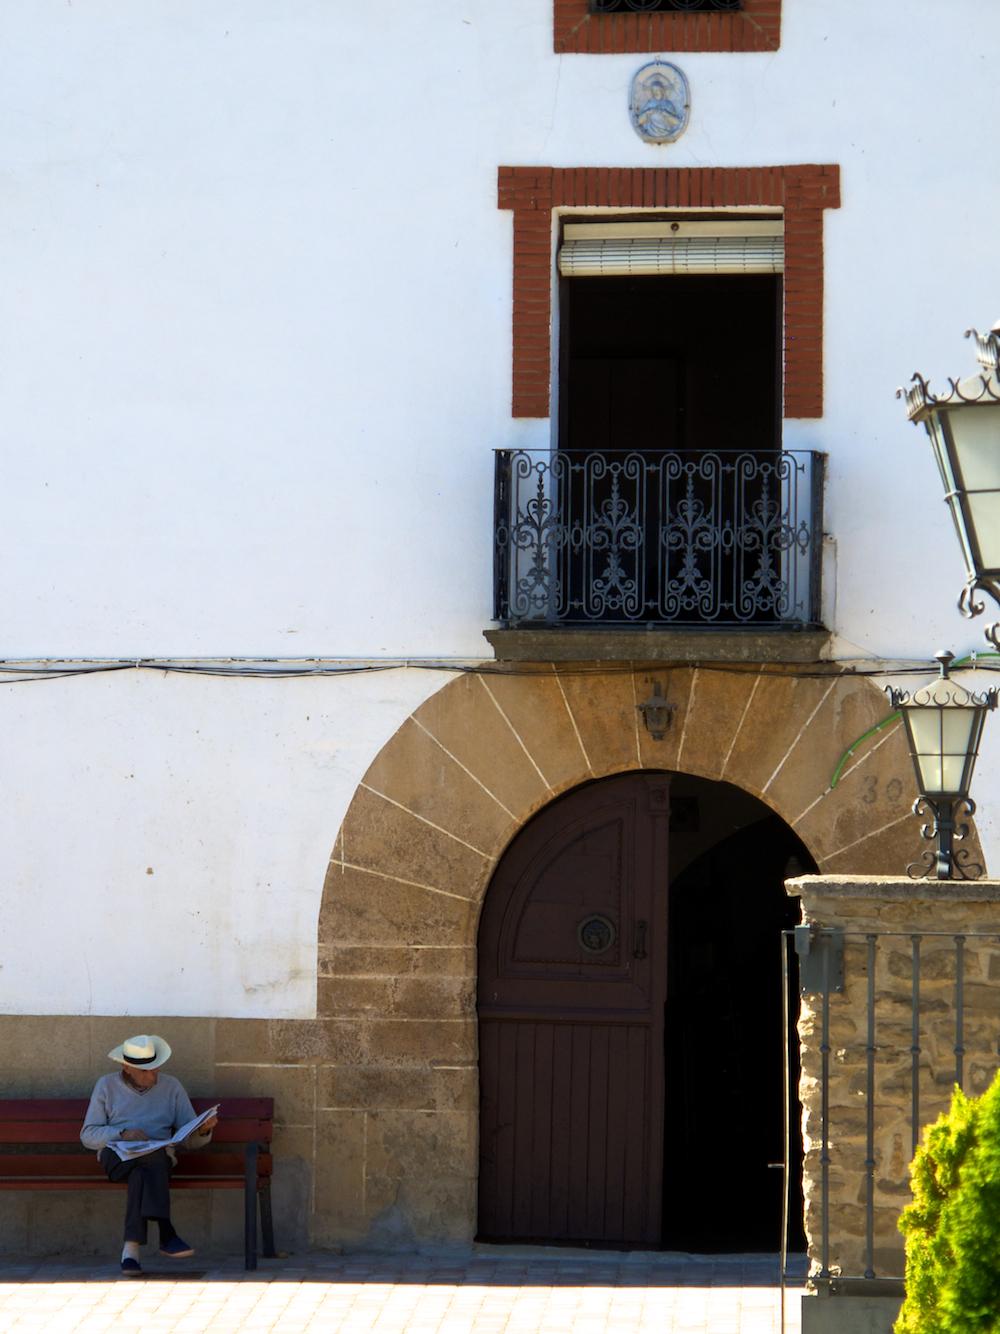 Man reading newspaper on Camino, Spain